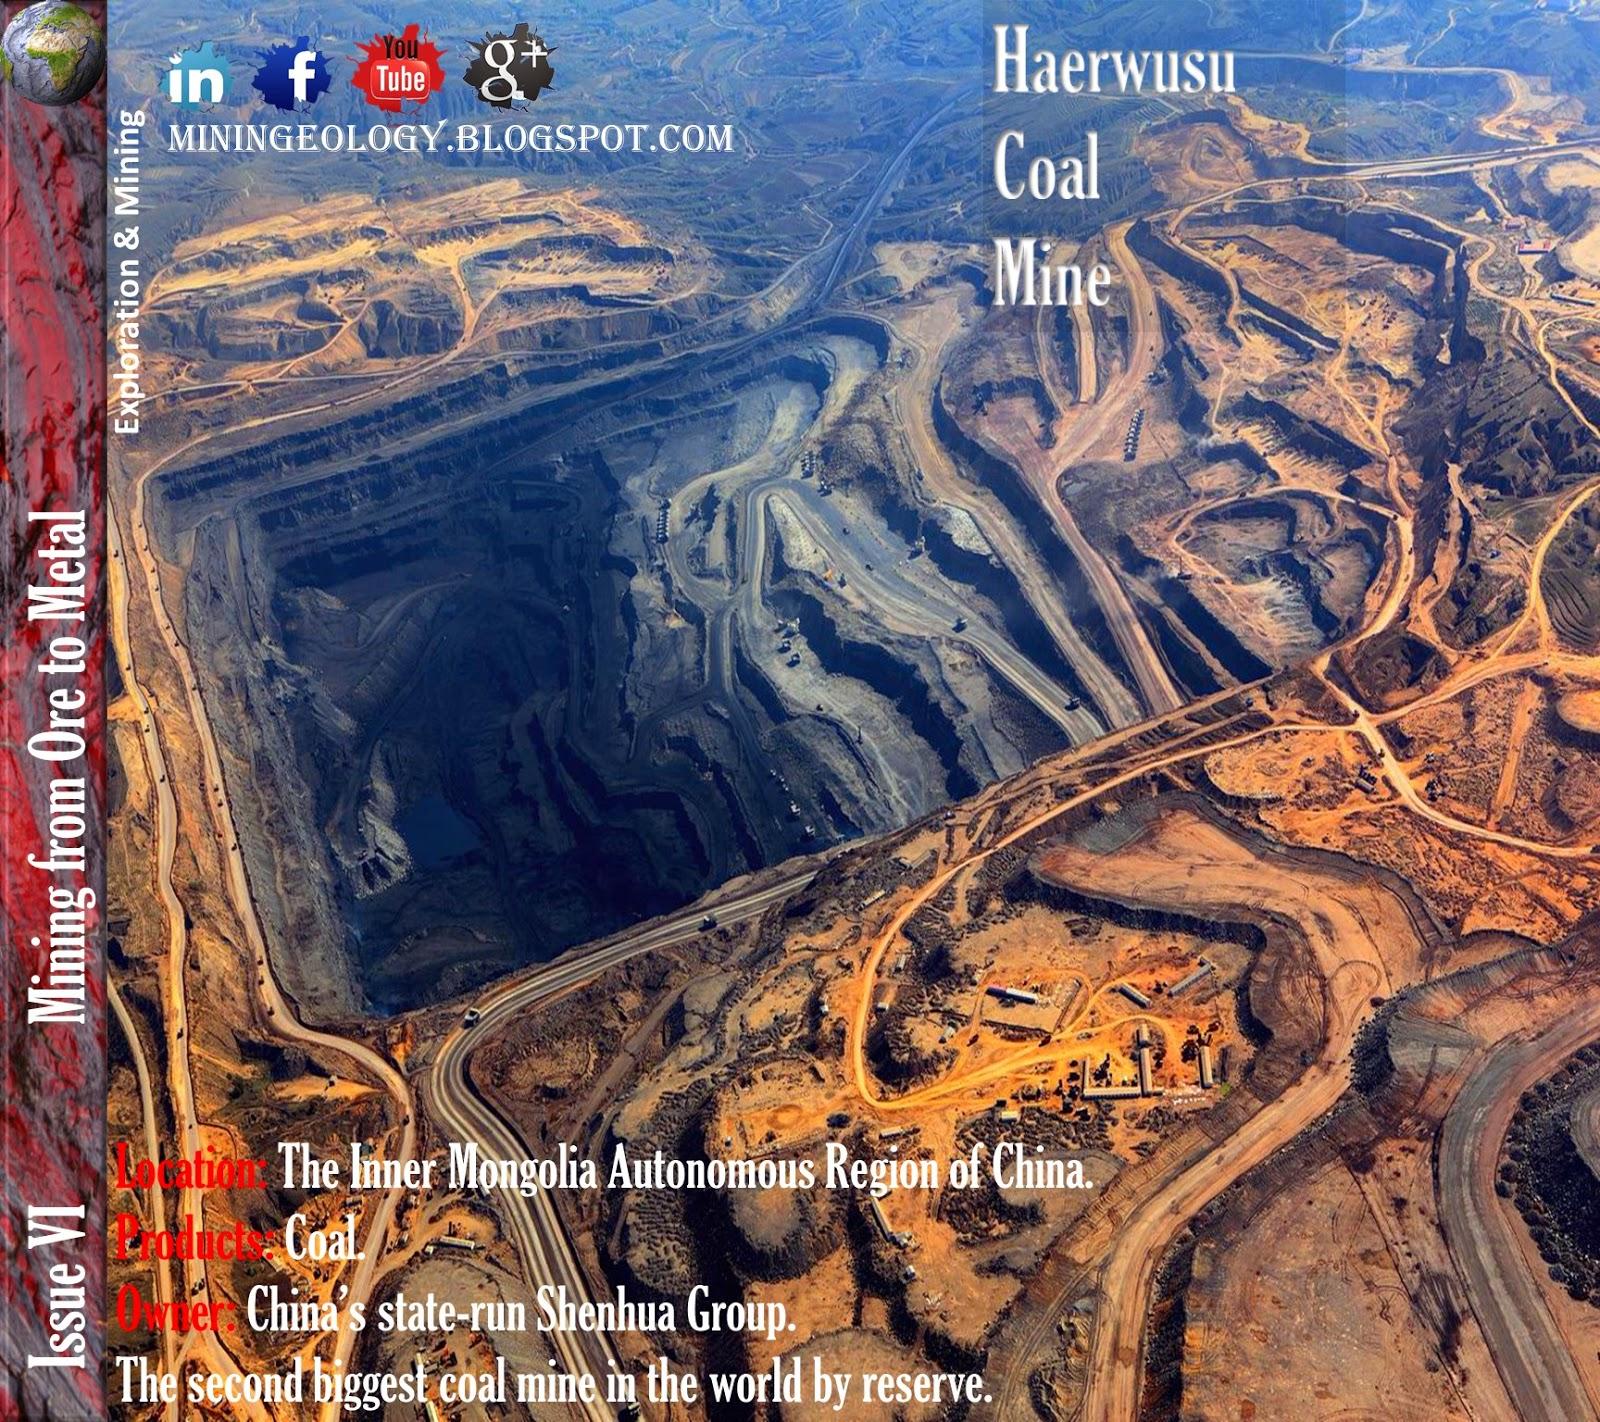 Haerwusu Coal Mine